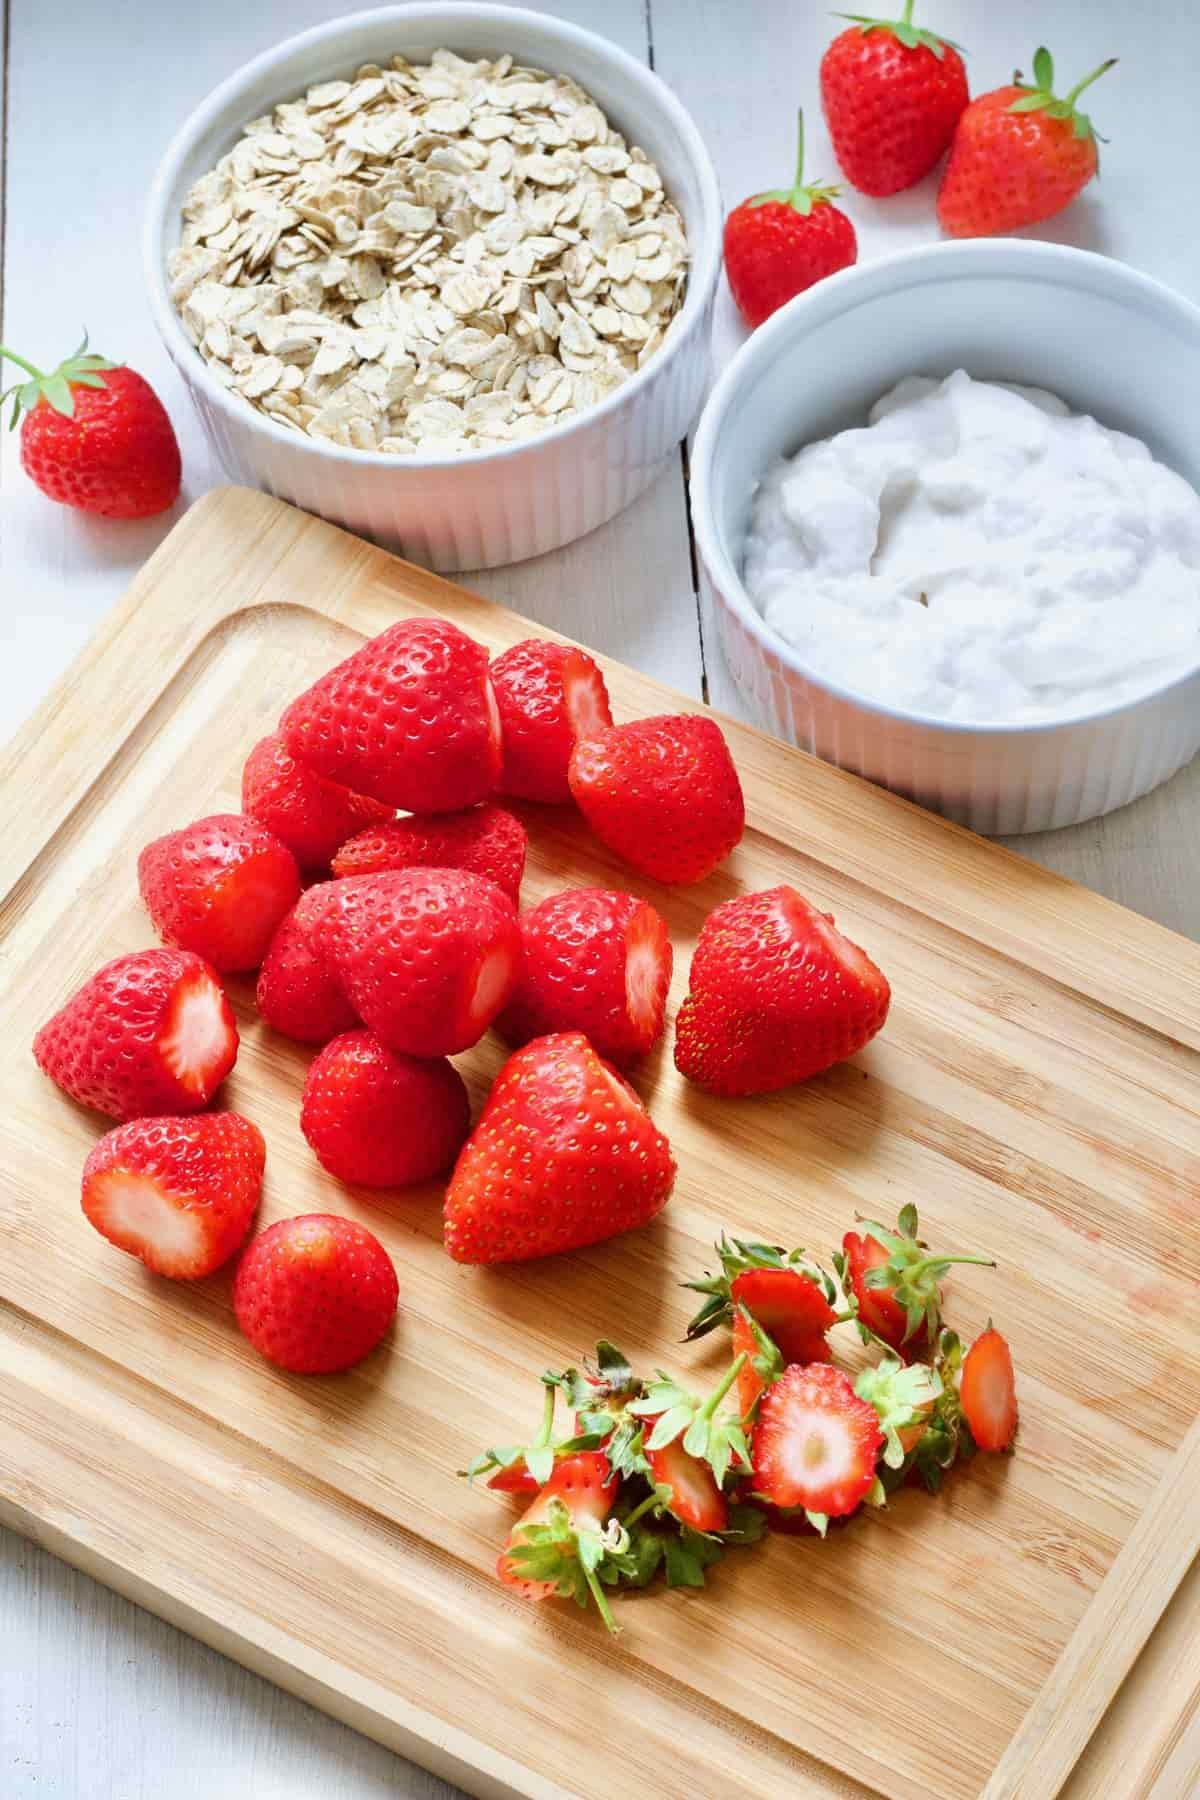 Hulled strawberries on a board, oats, yogurt.